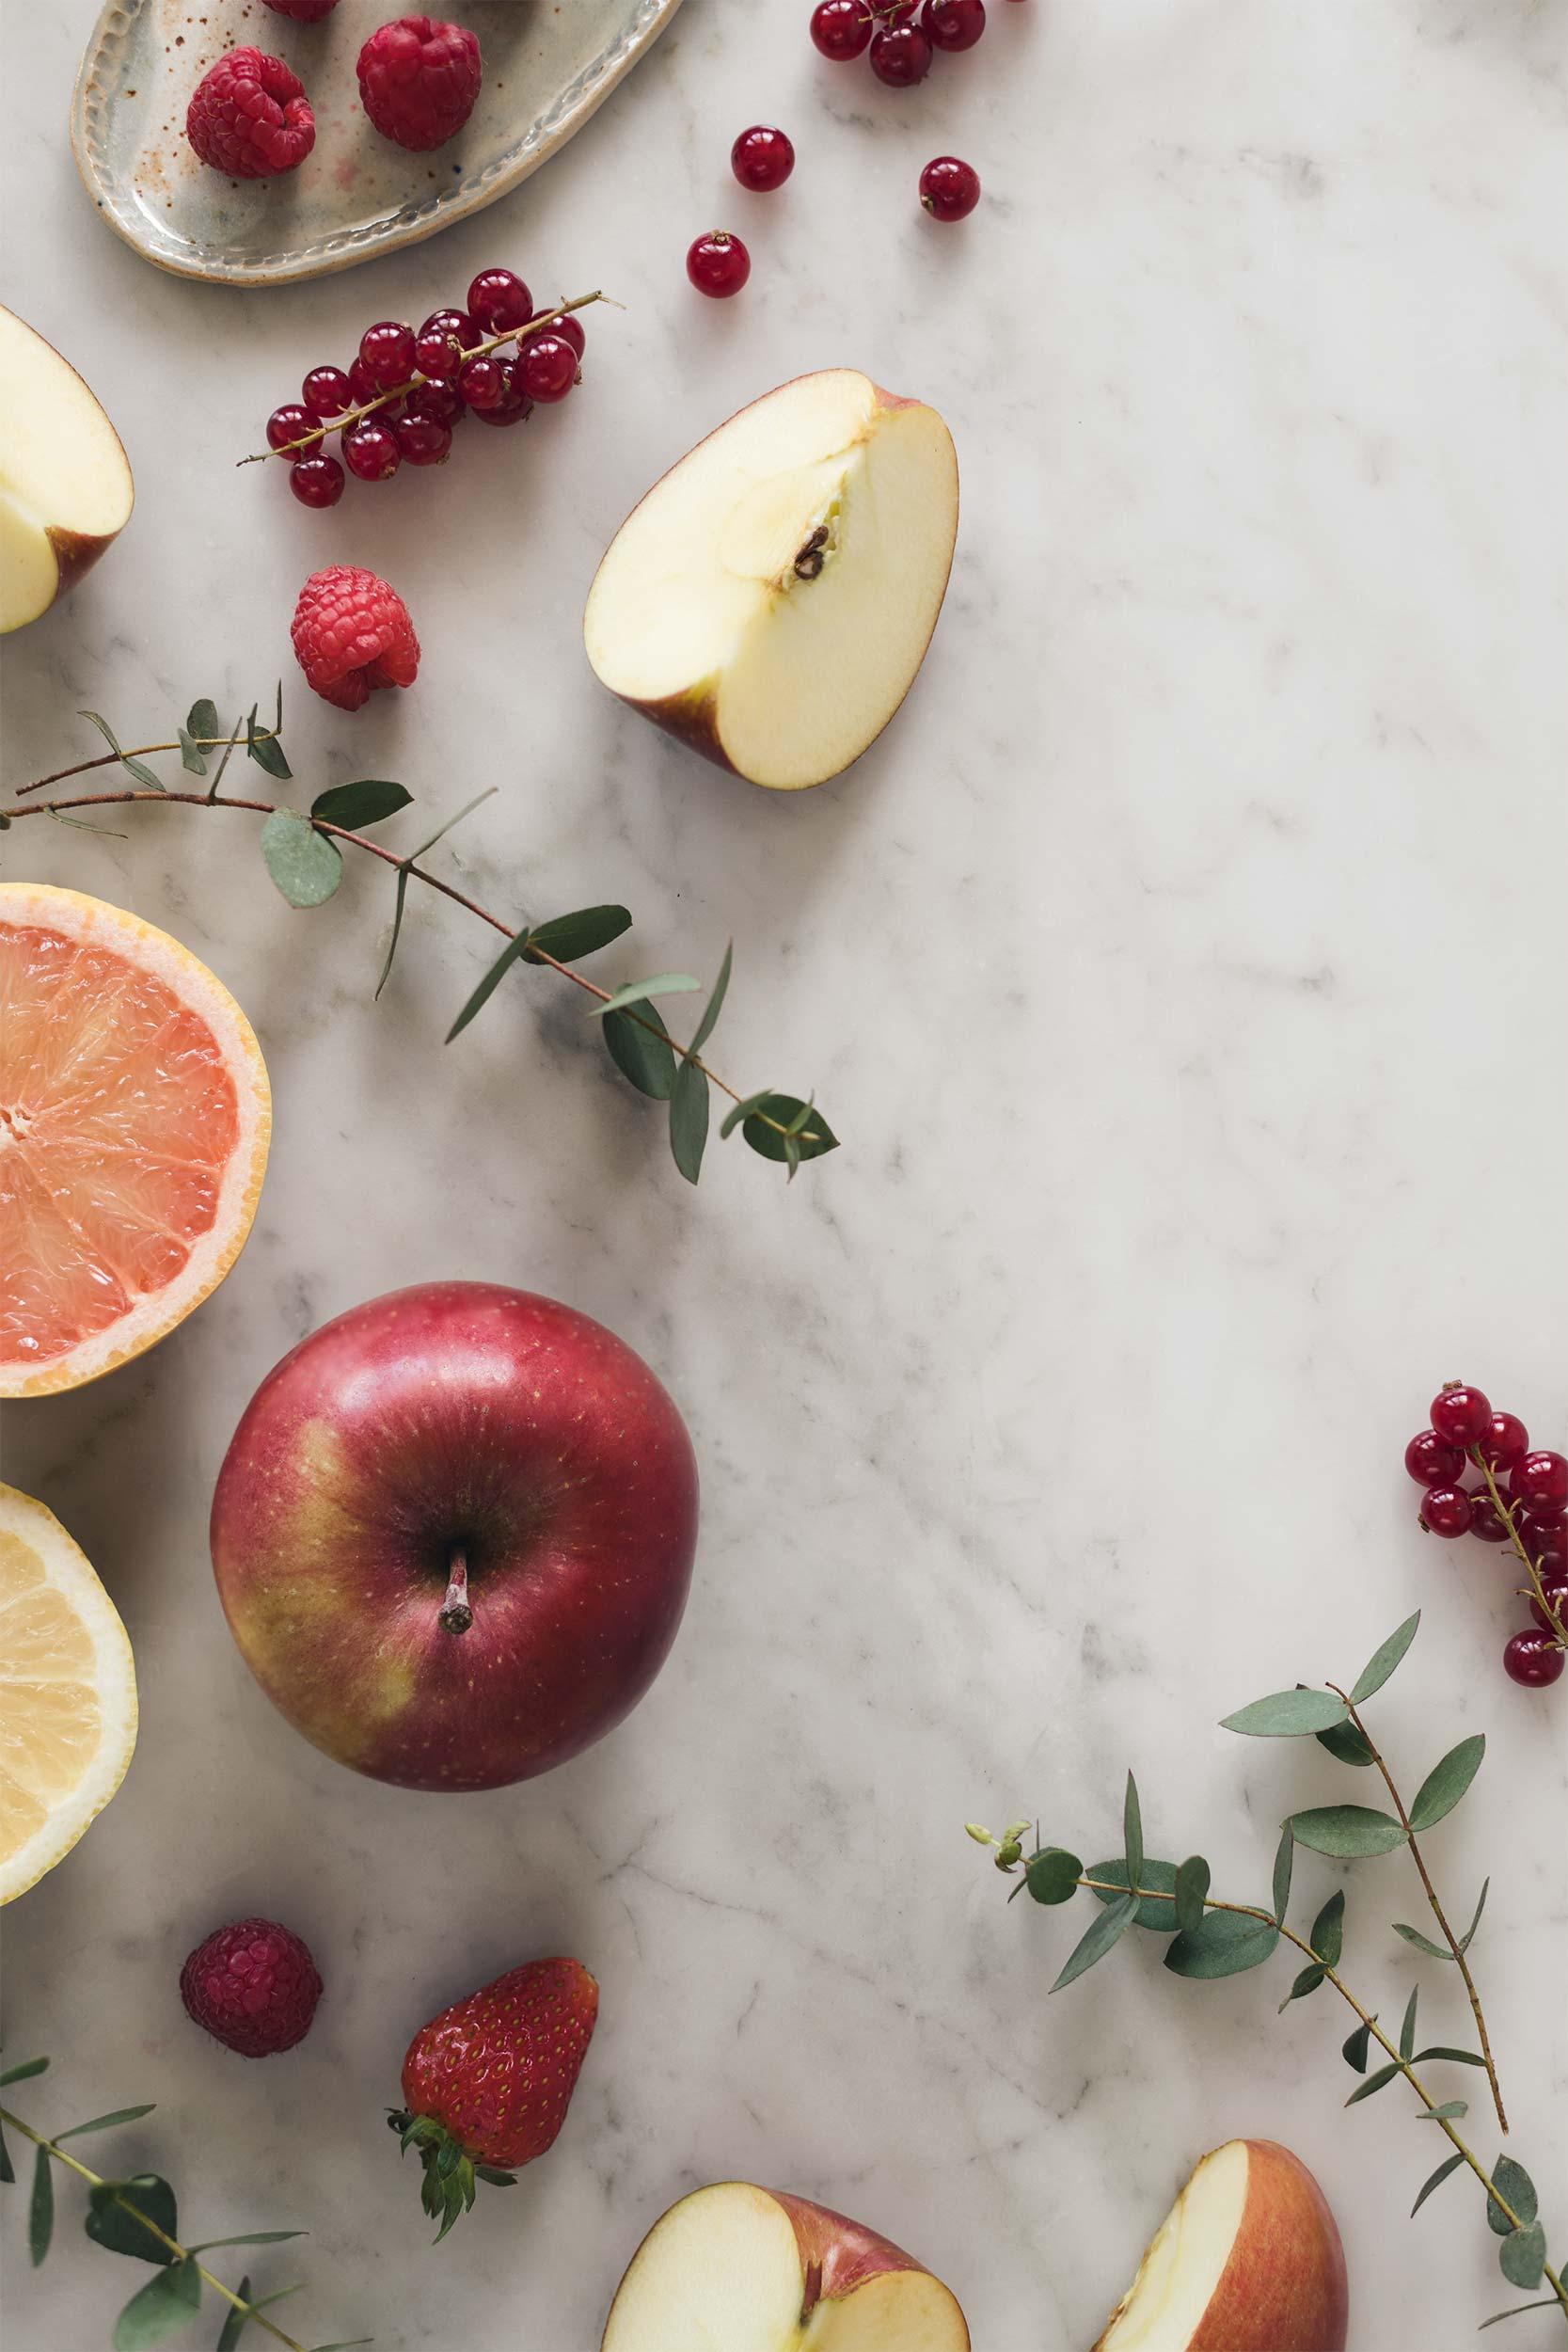 fruity apple iced tea ingredients